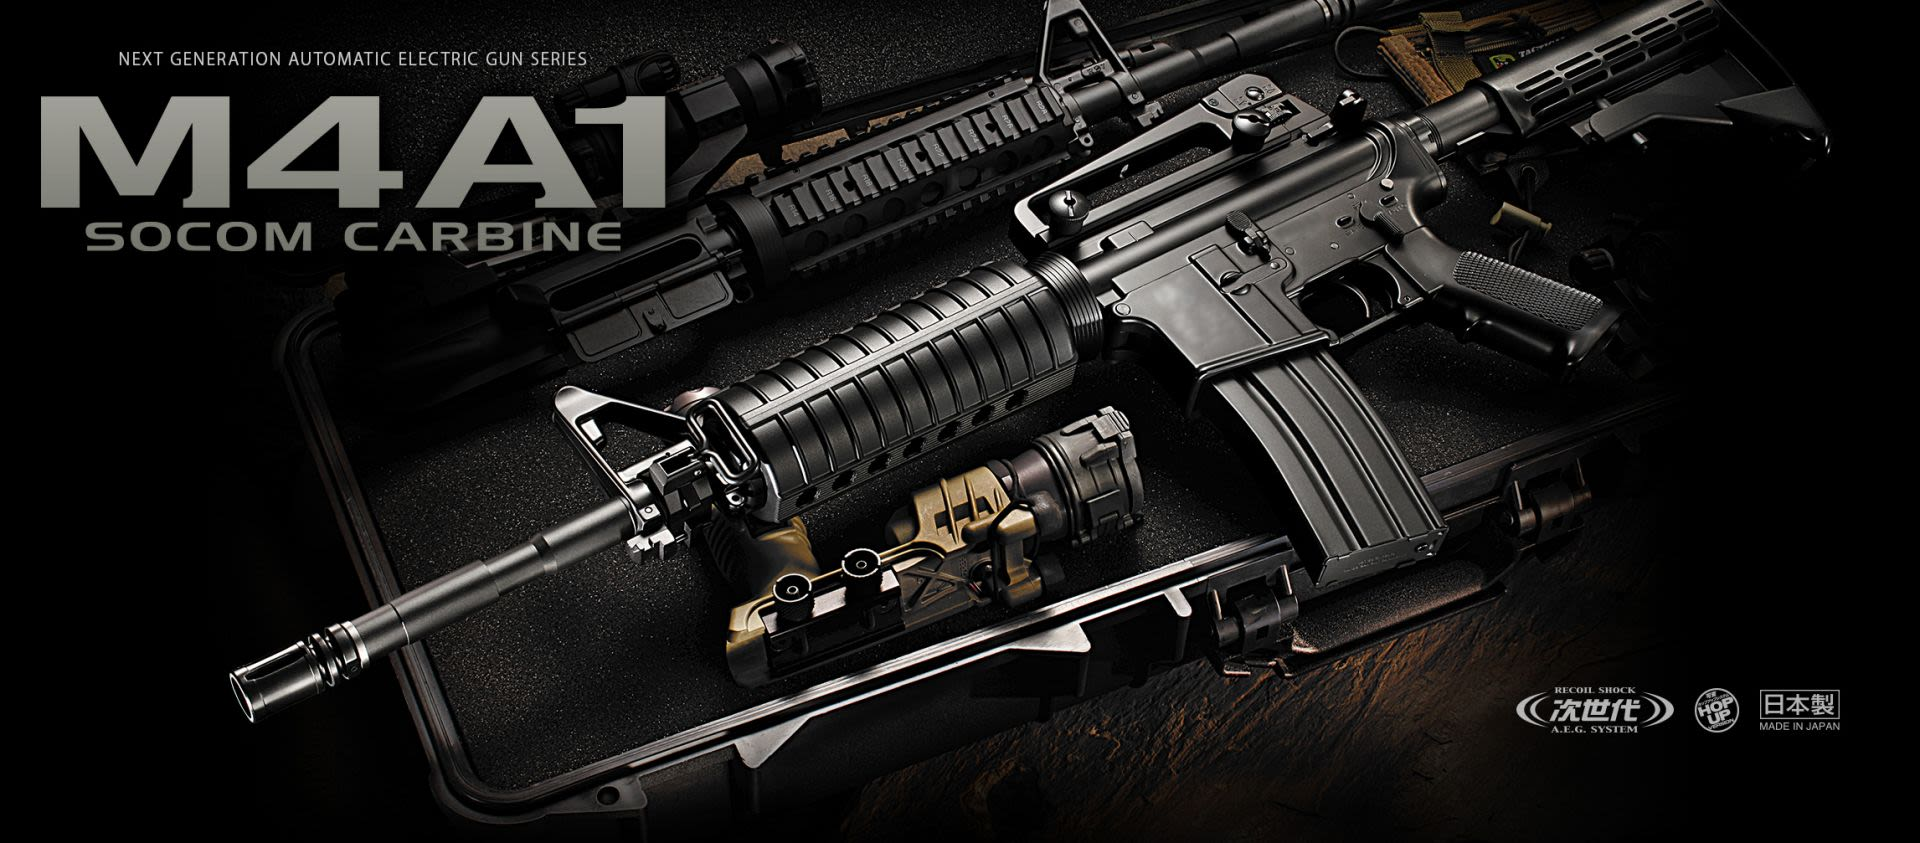 M4A1 Socom Carabine SRE